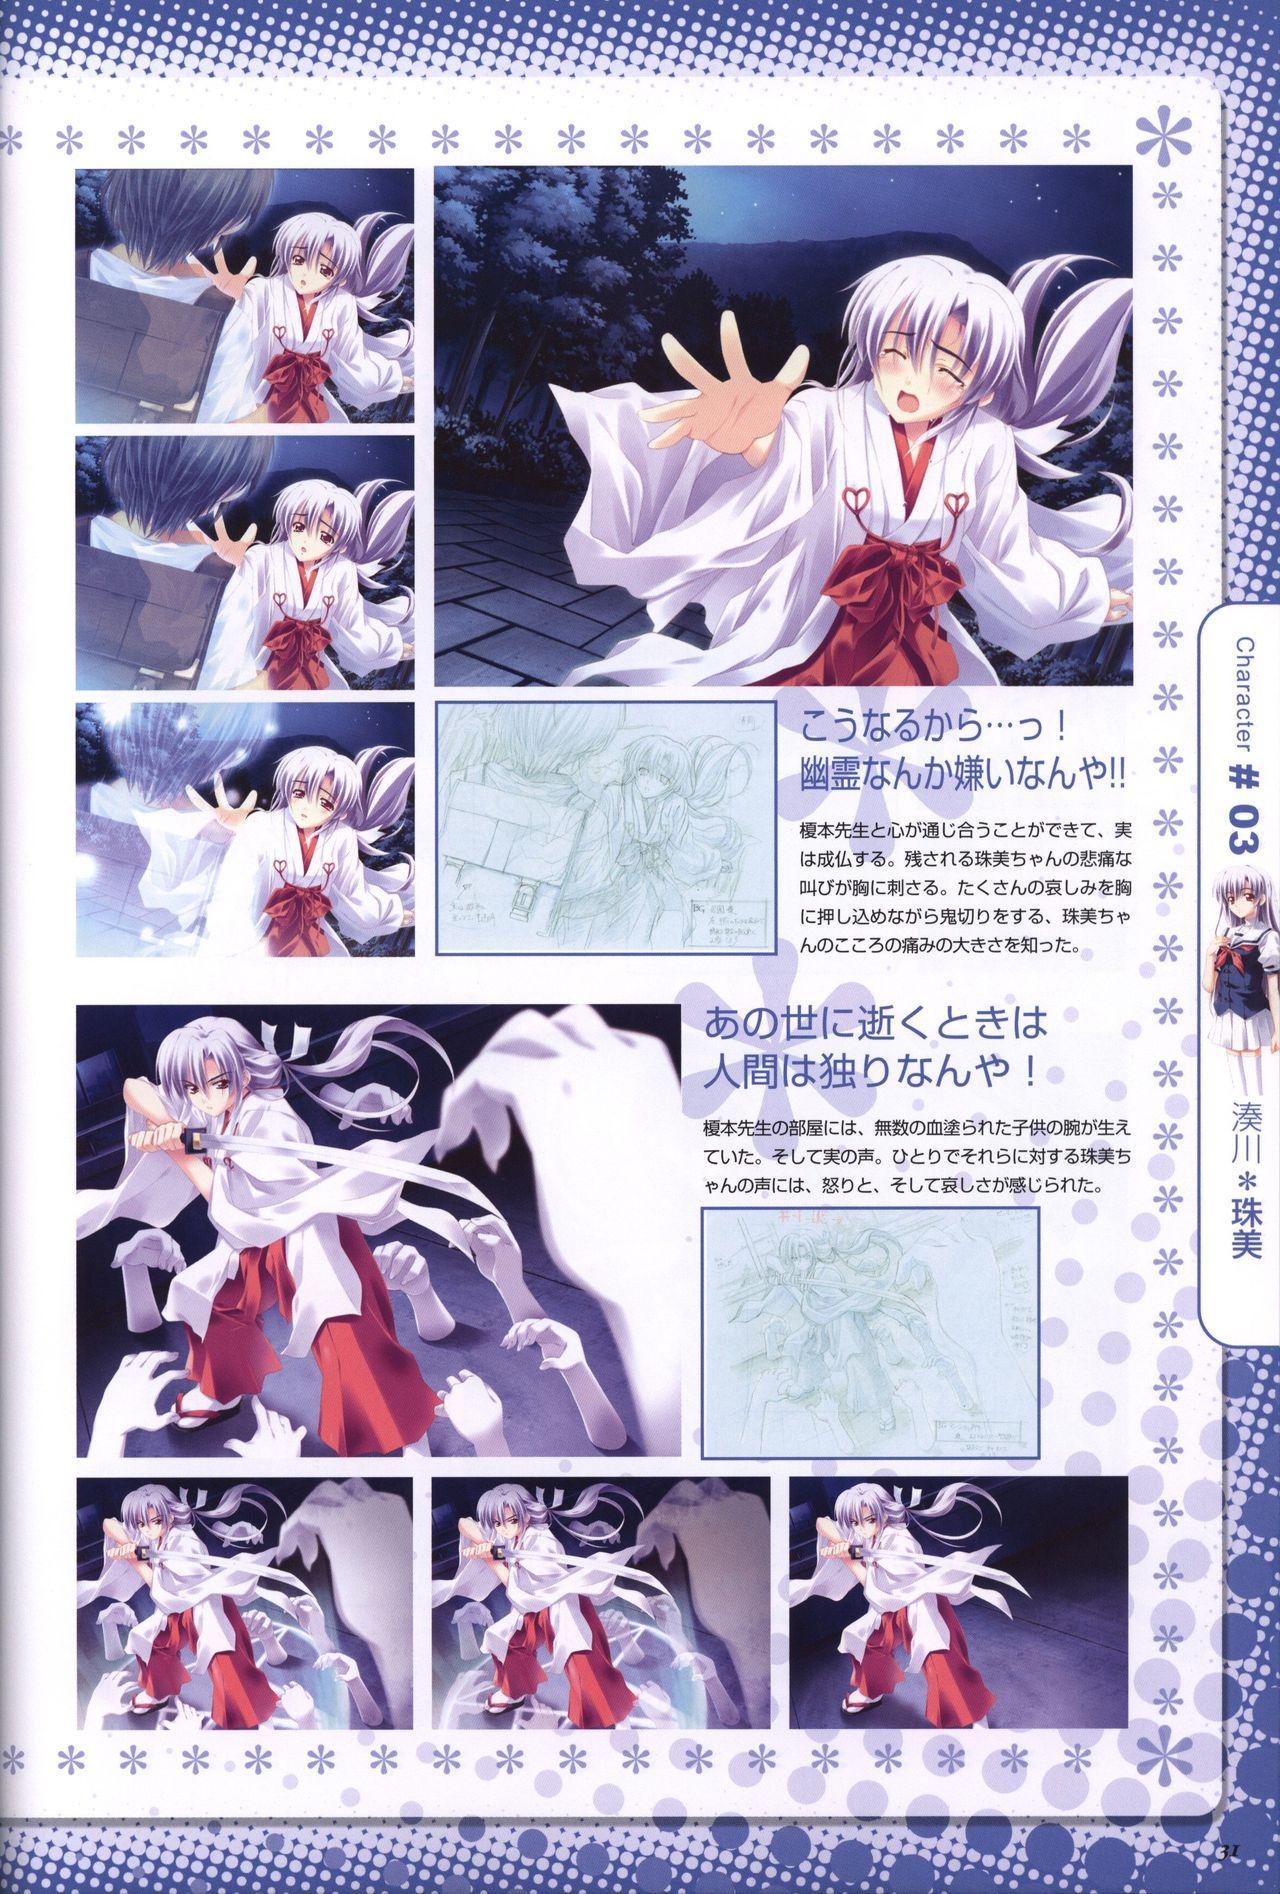 Moshimo Ashita ga Harenaraba official fanbook 31